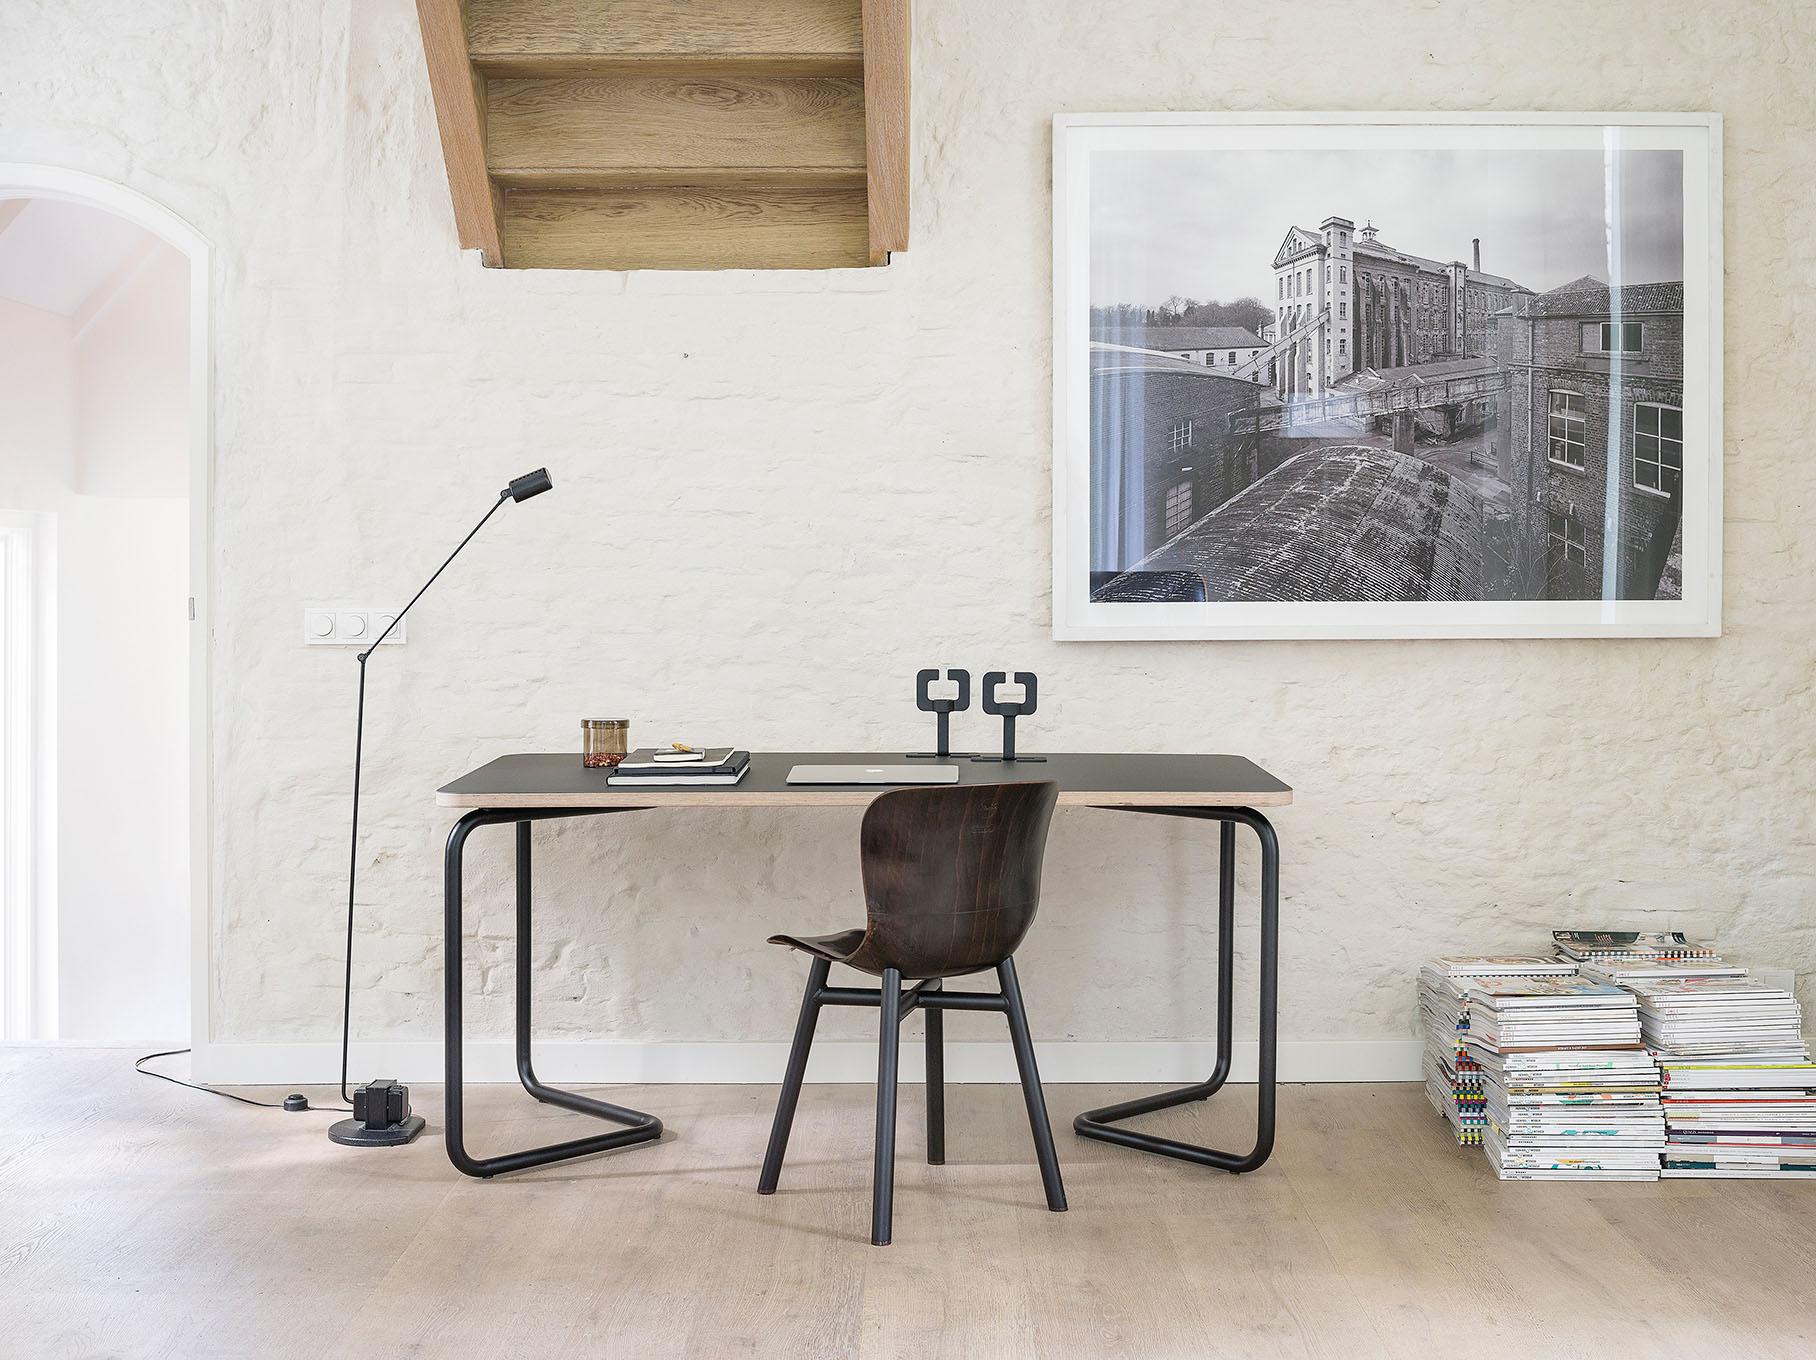 KUMPEL_table_Black+charcoal_160X80.jpg